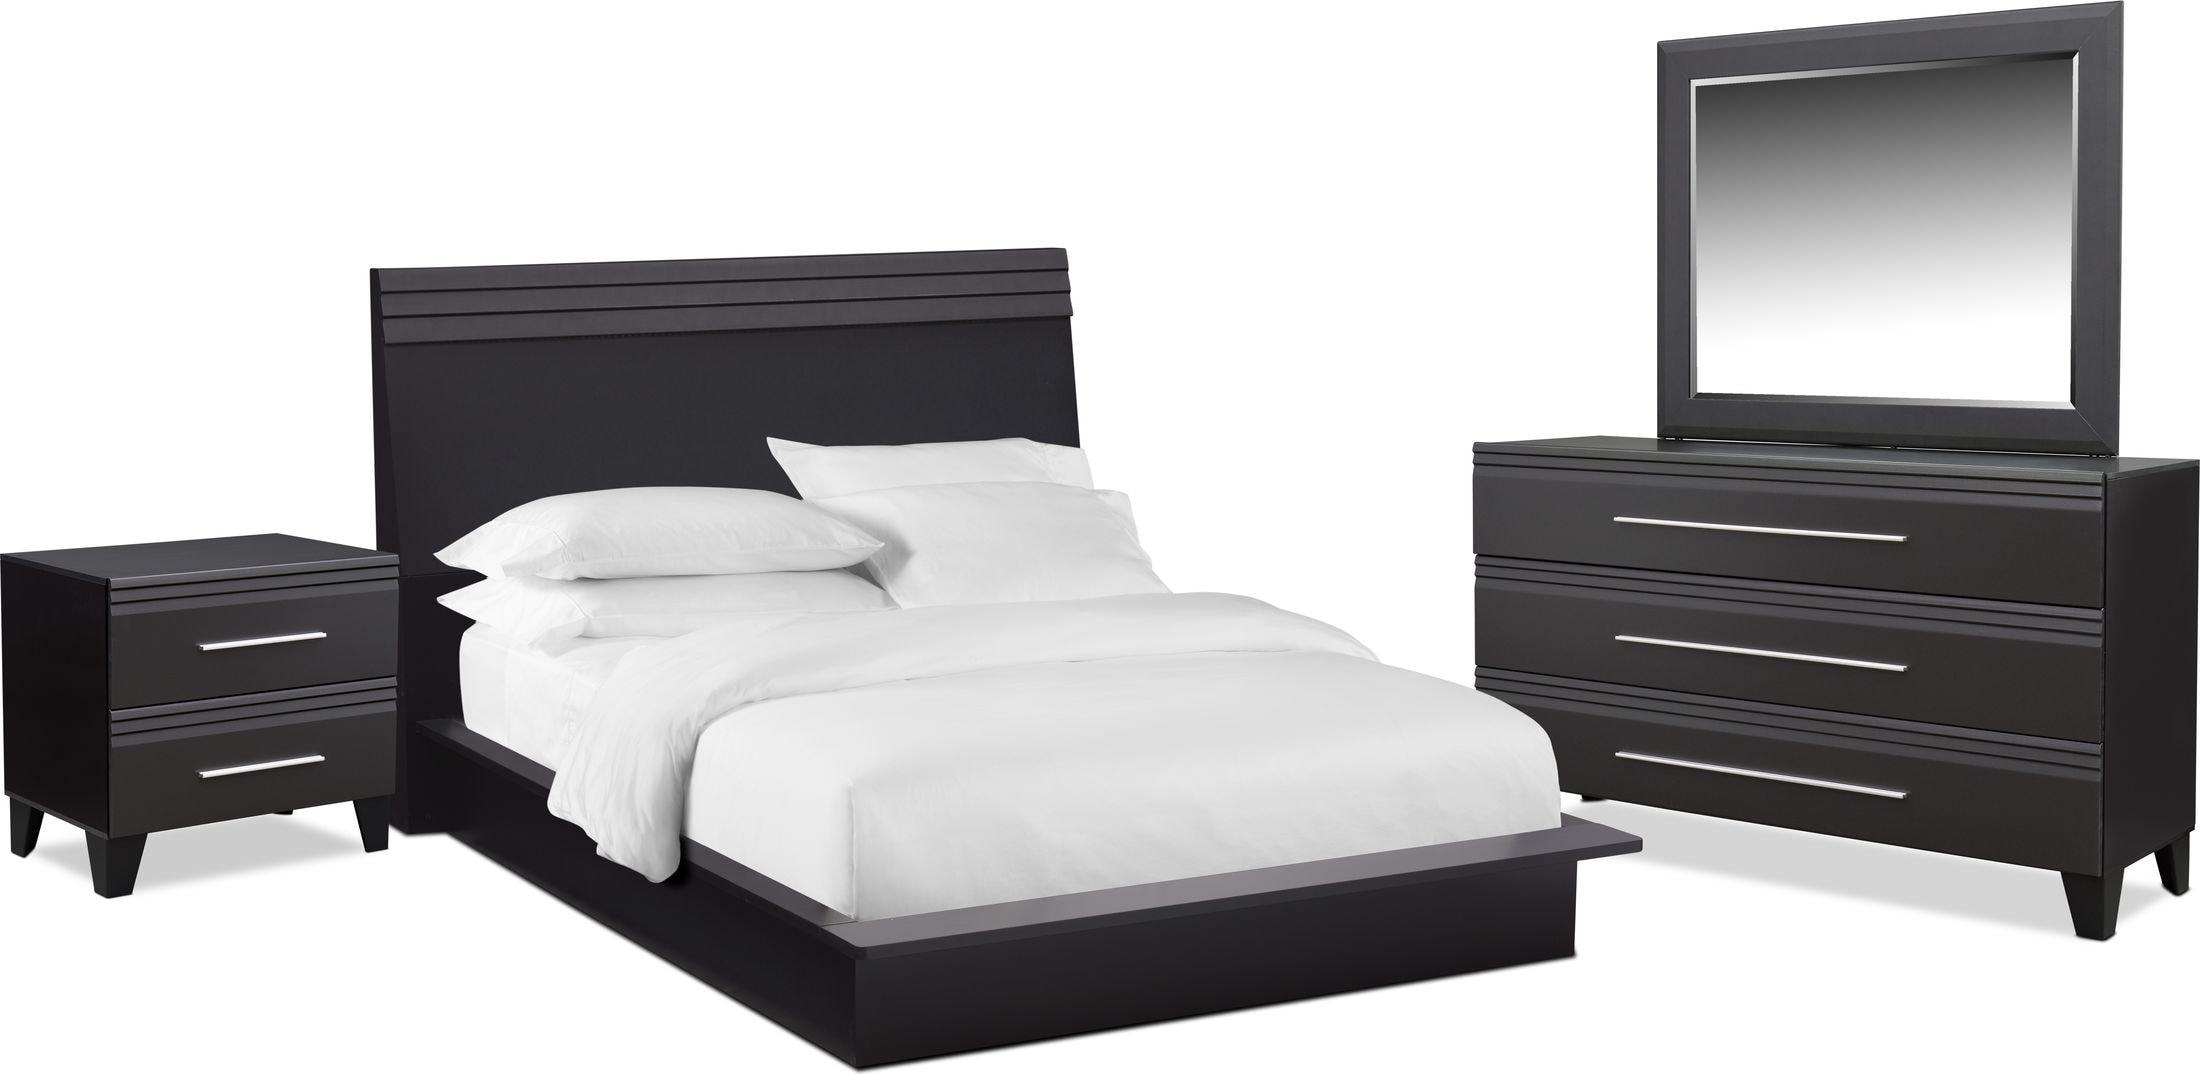 Bedroom Furniture - Allori 6-Piece Panel Bedroom Set with Nightstand, Dresser and Mirror